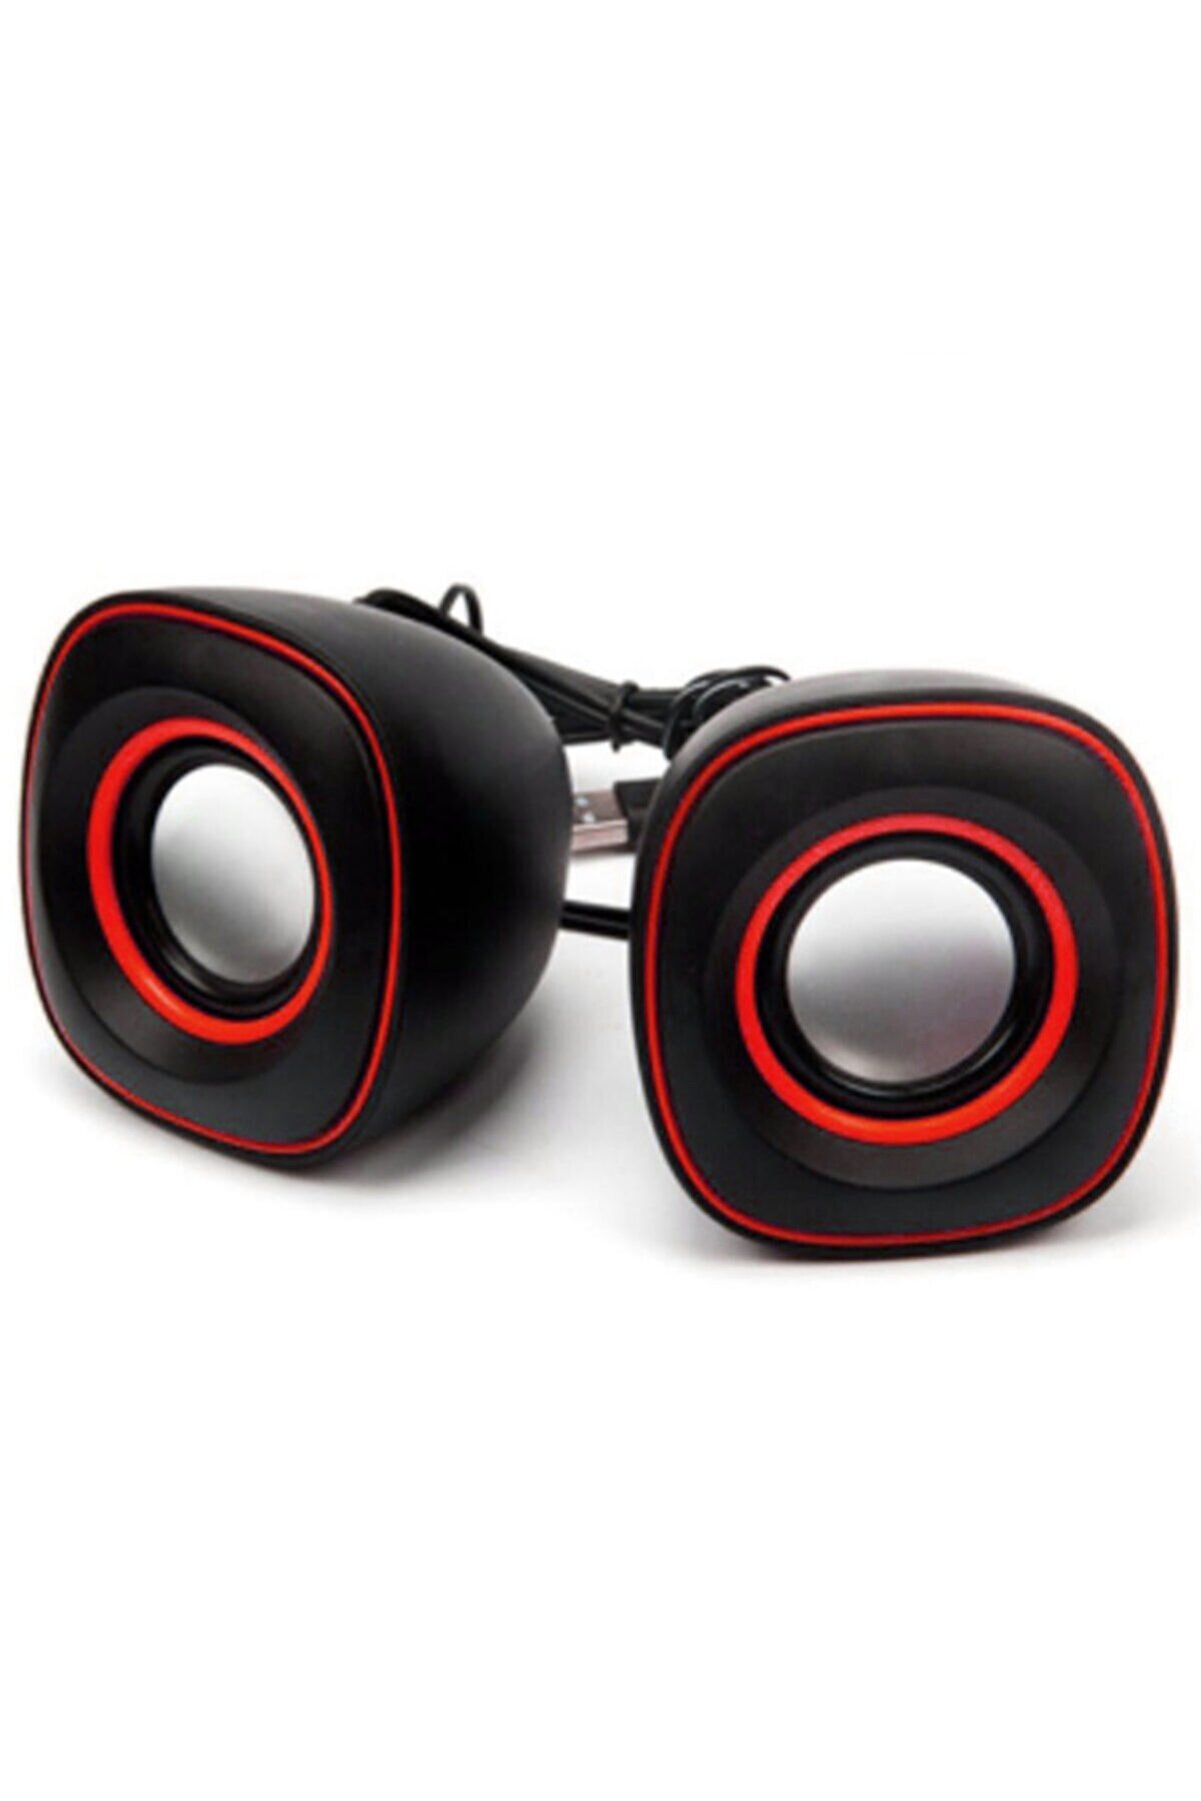 WOZLO 1+1 Mini Usb 2.0 Hoparlör Ses Sistemi Pc Laptop Notebook Speaker